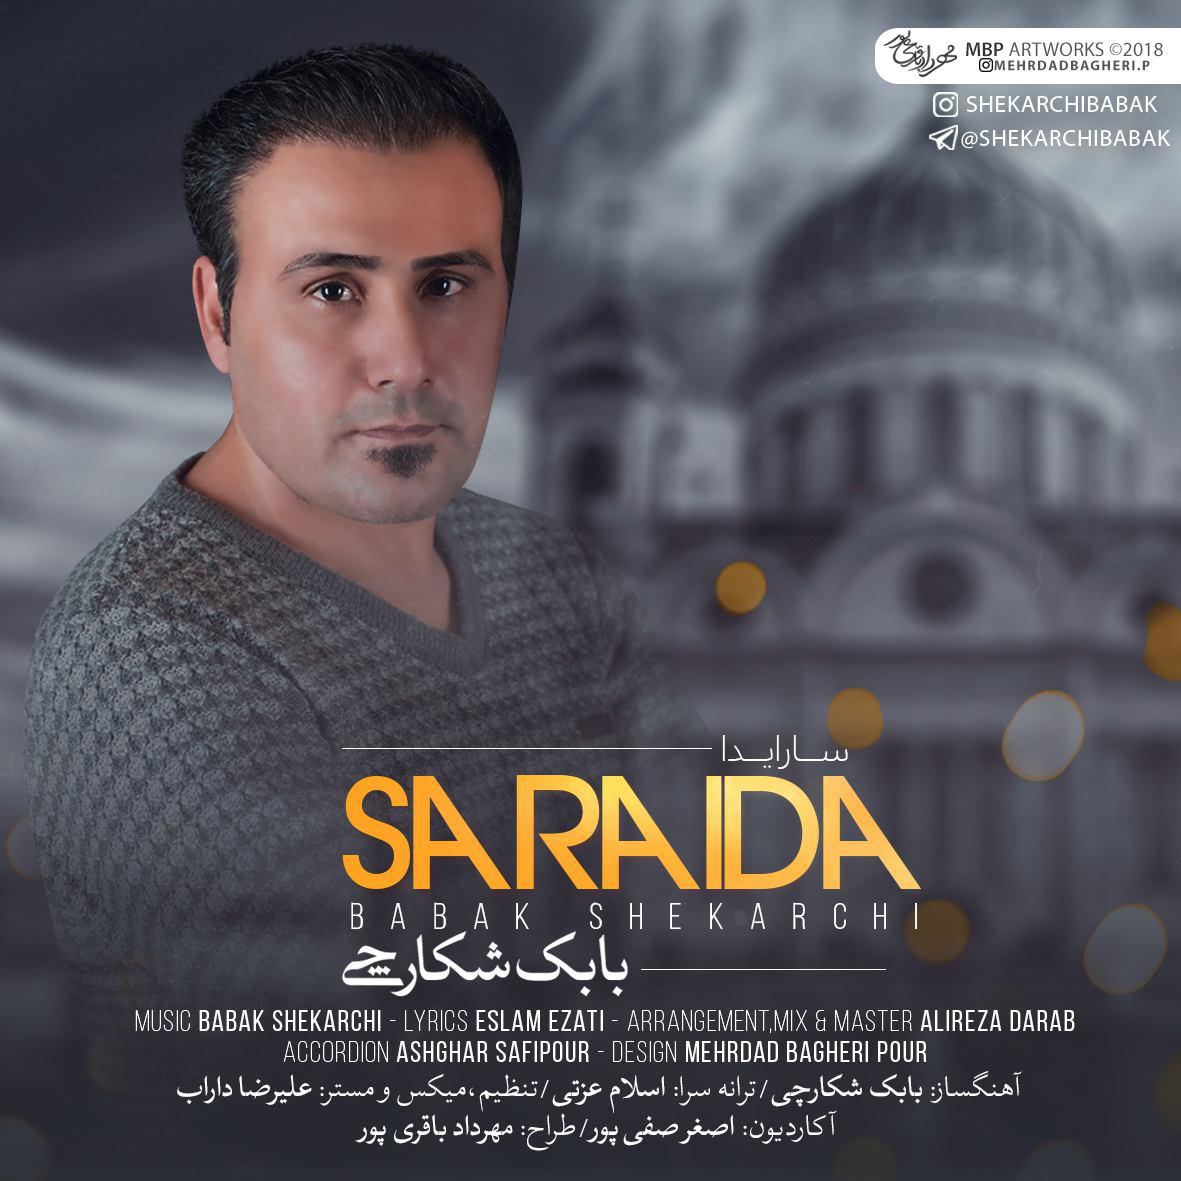 http://s8.picofile.com/file/8322506234/07Babak_Shekarchi_%E2%80%93_Saraida.jpg